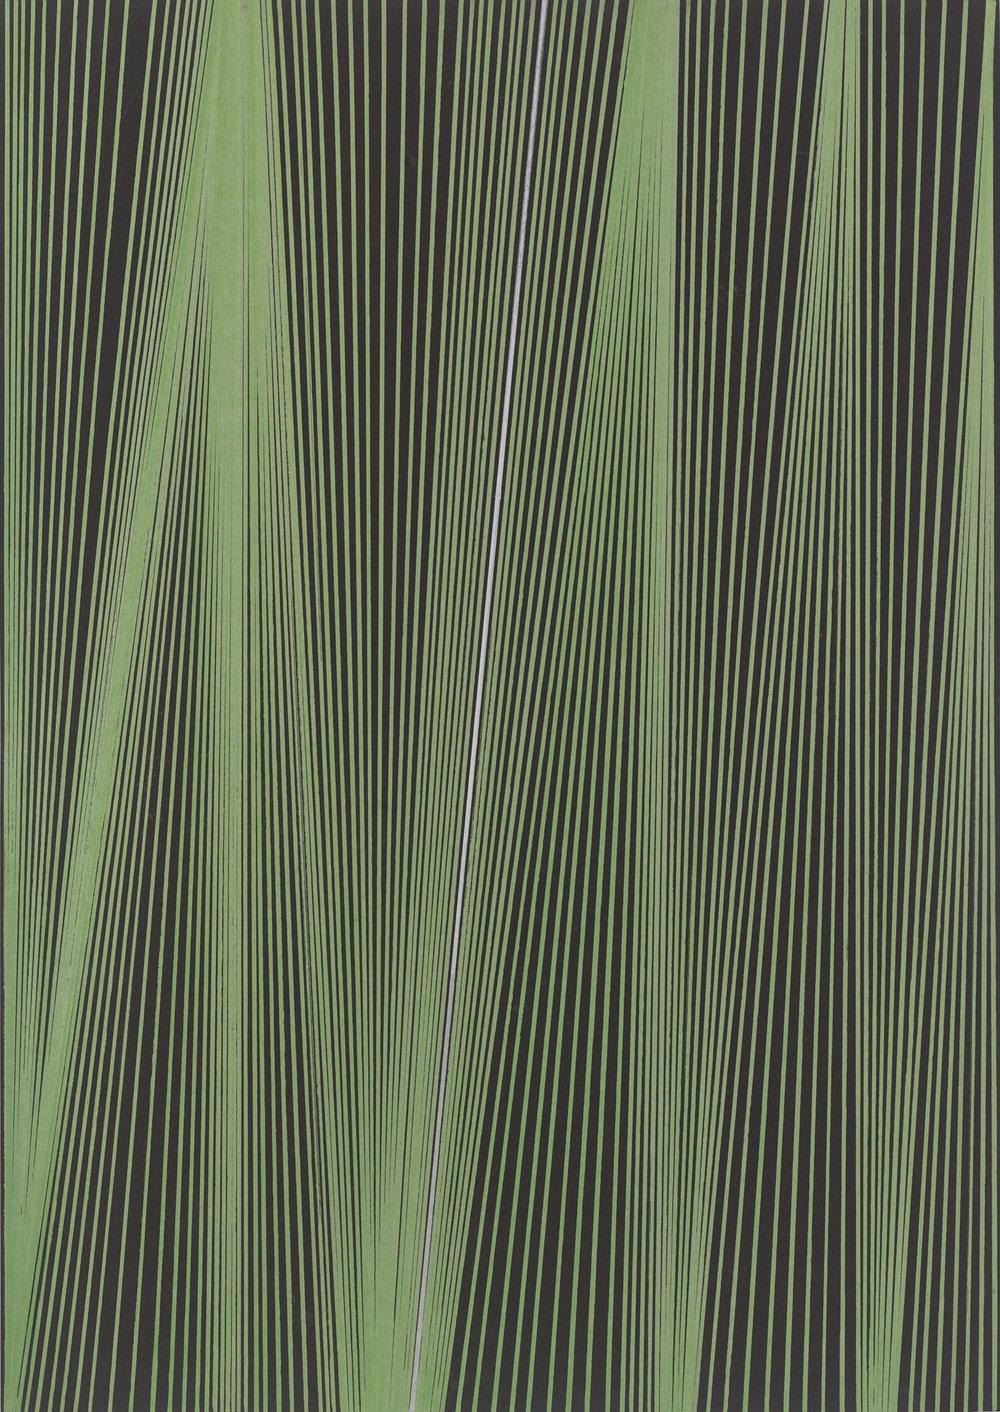 BK P44961 | UNTITLED | GREEN AND SILVER METALLIC ACRYLIC ON BLACK CARD BOARD | 42 X 29,7 CM | 2019.jpg